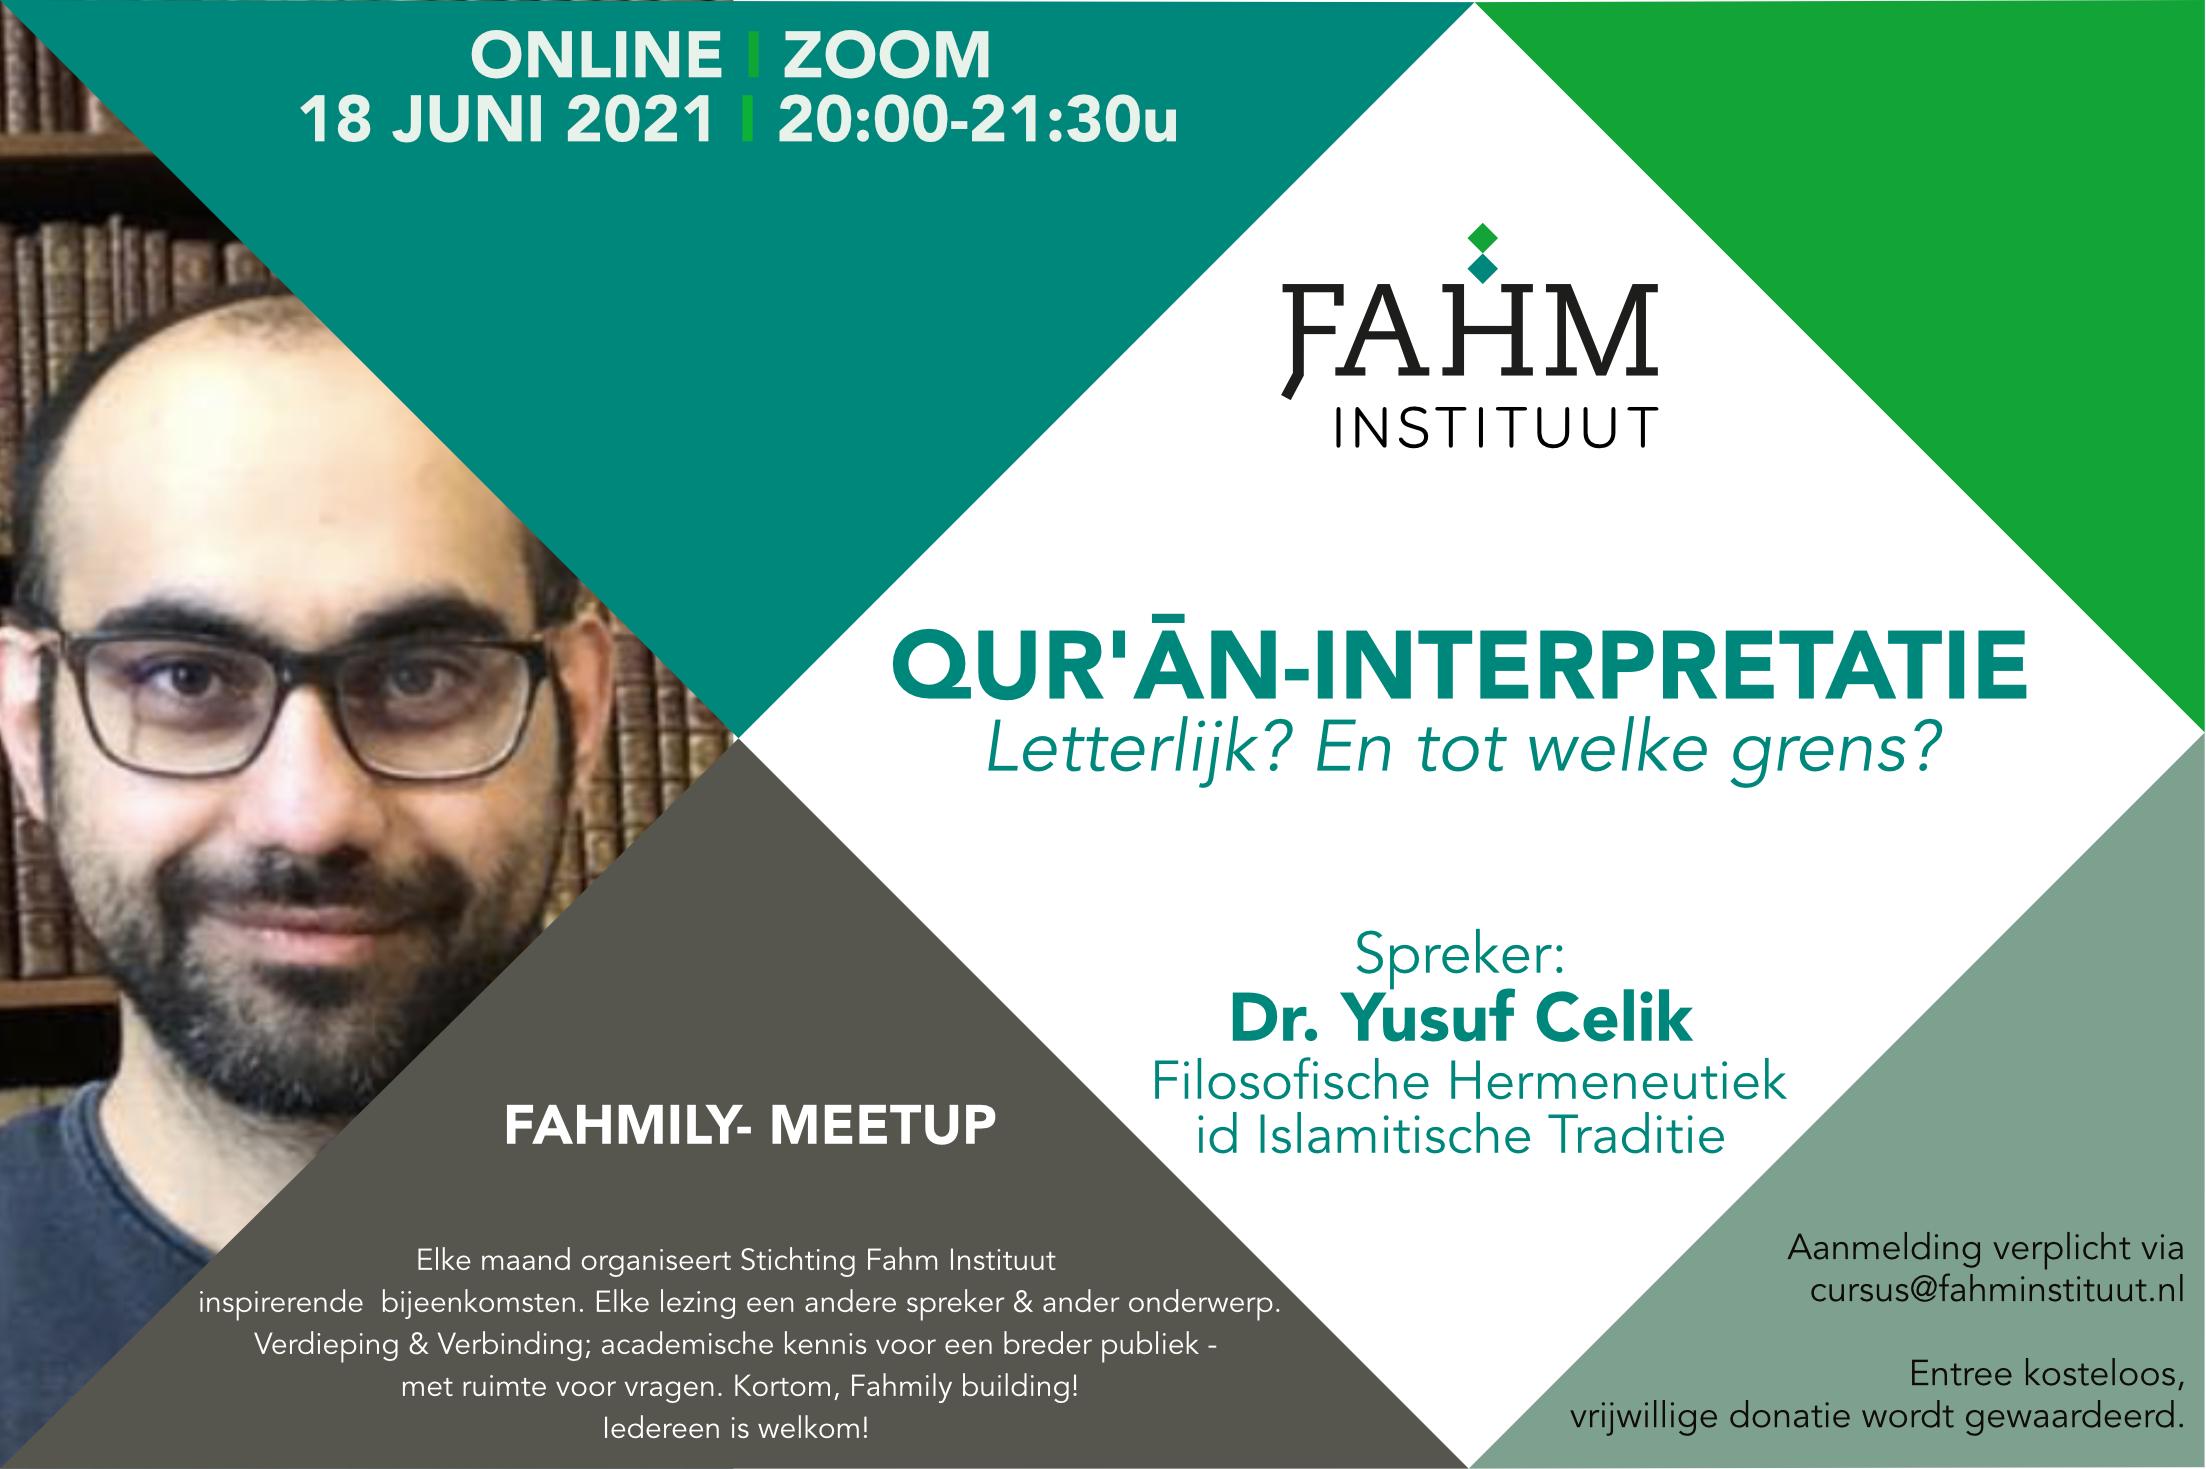 Fahm-ily flyer